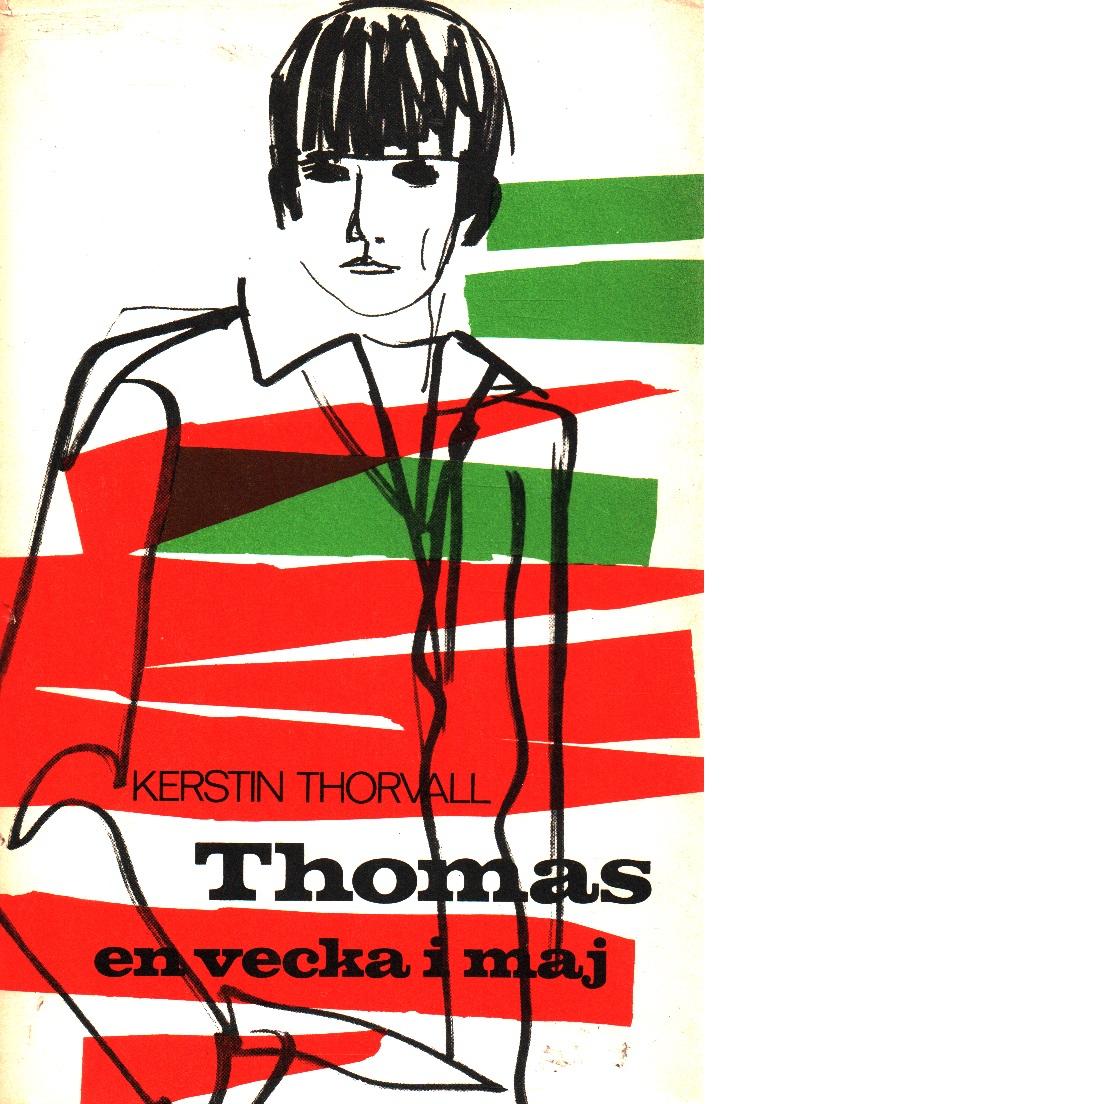 Thomas - en vecka i maj - Thorvall, Kerstin